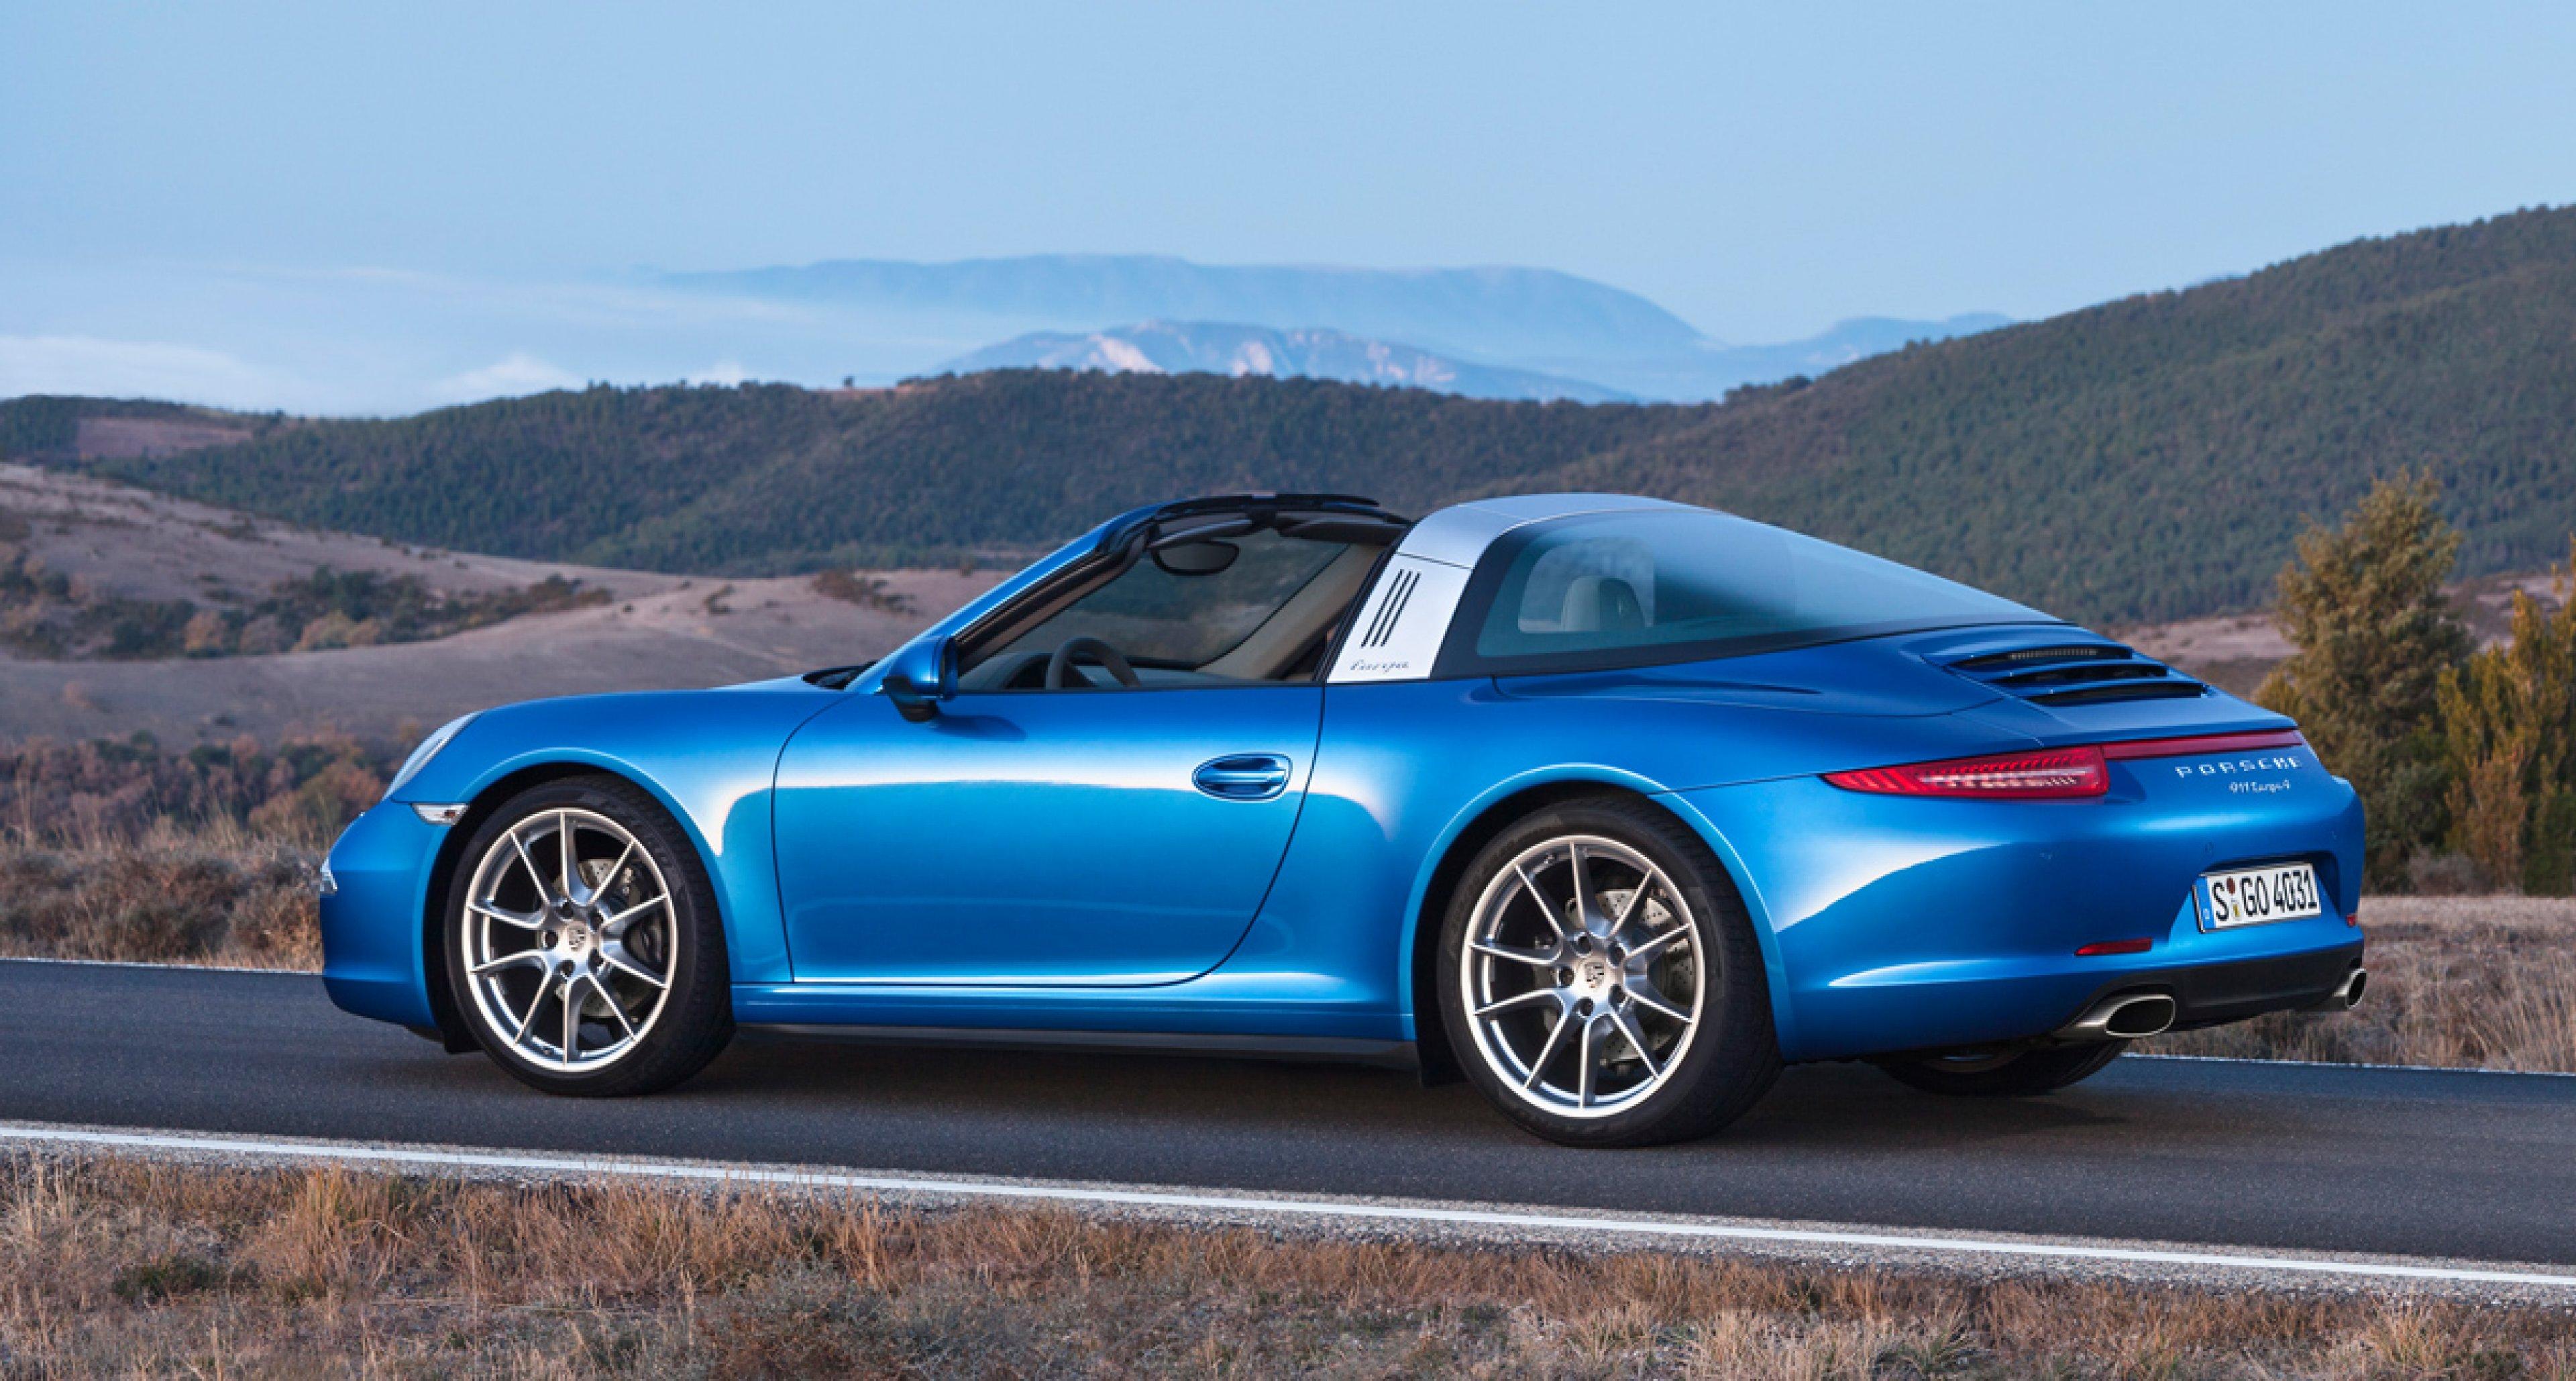 Porsche 911 Targa: Dramatic debut of a modern classic | Classic ...